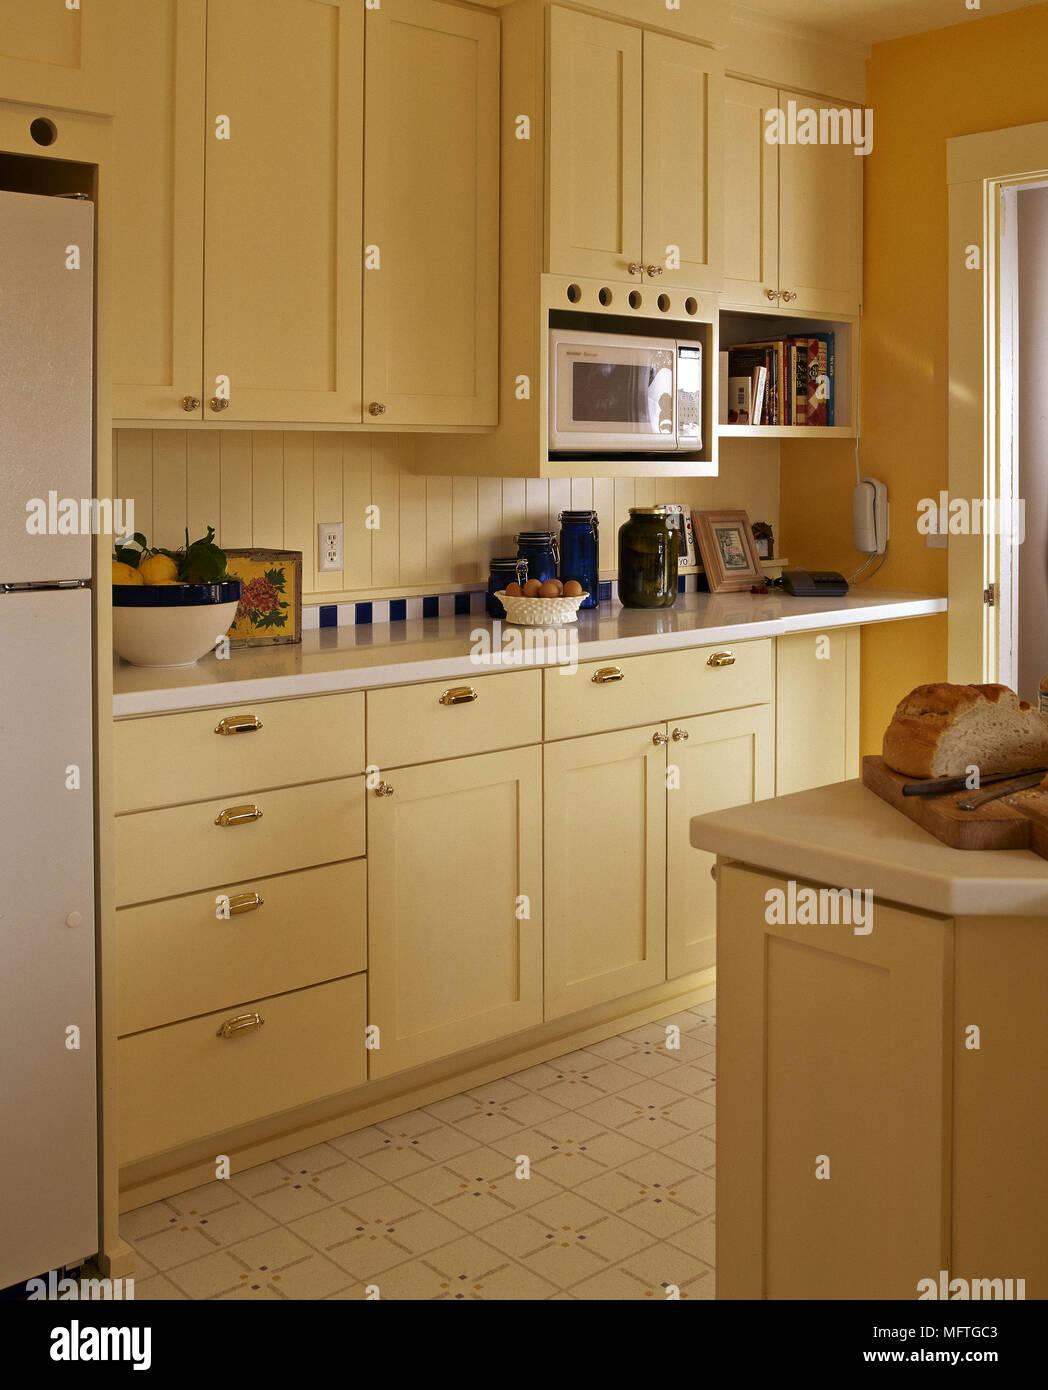 Modern Shaker Style Kitchen: Shaker Style Stock Photos & Shaker Style Stock Images